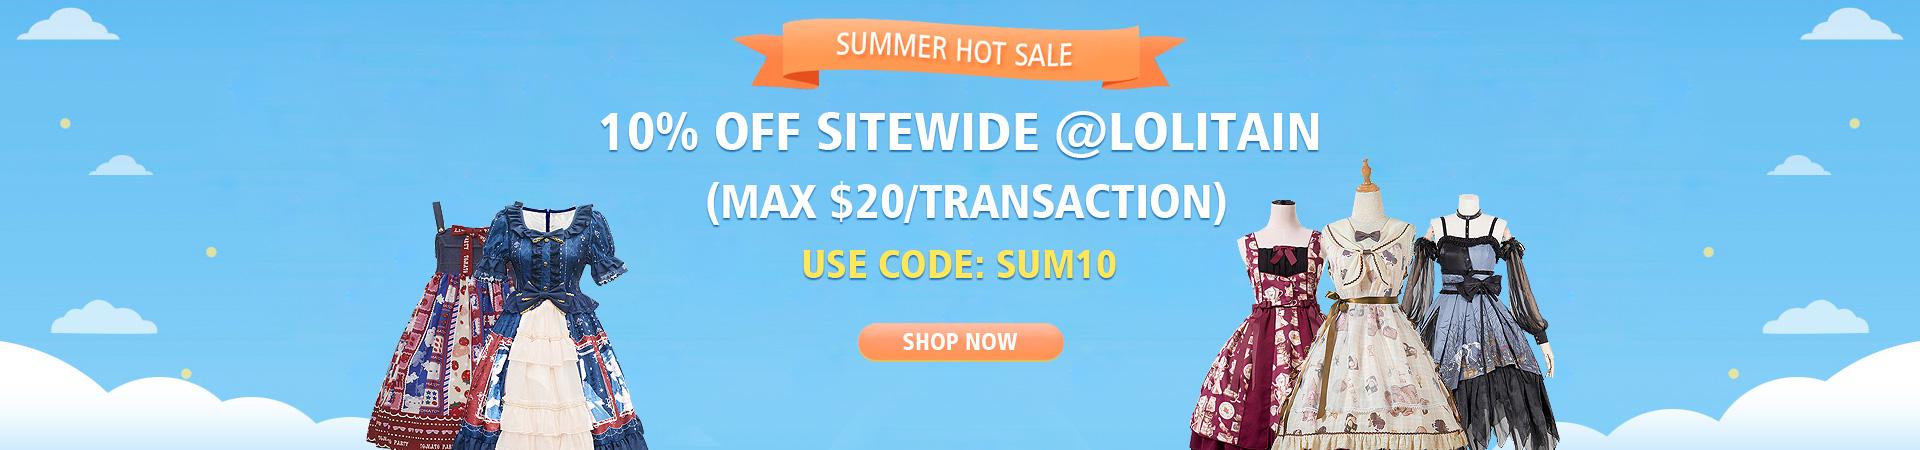 Lolita Dresses Summer Hot Sale